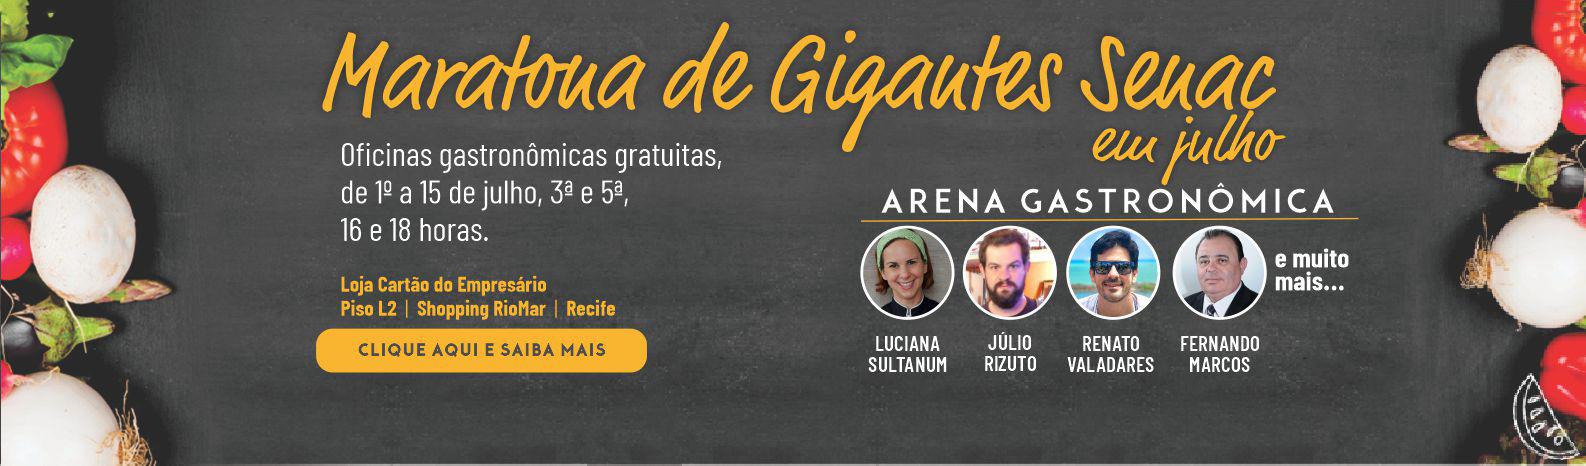 banner-arena-gigantes